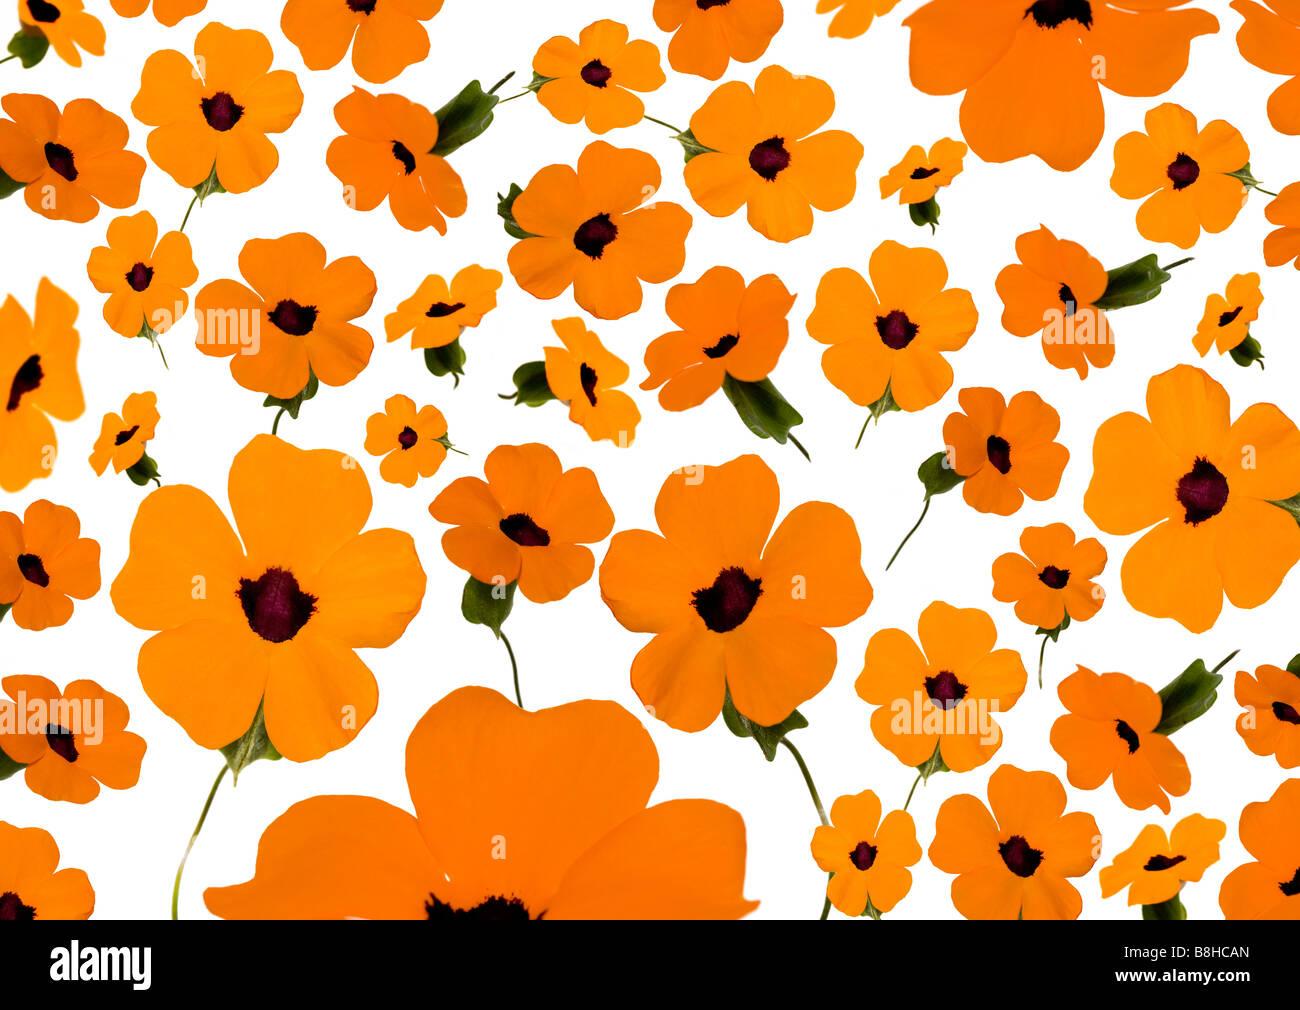 Fotomontaje de flores de naranja Imagen De Stock